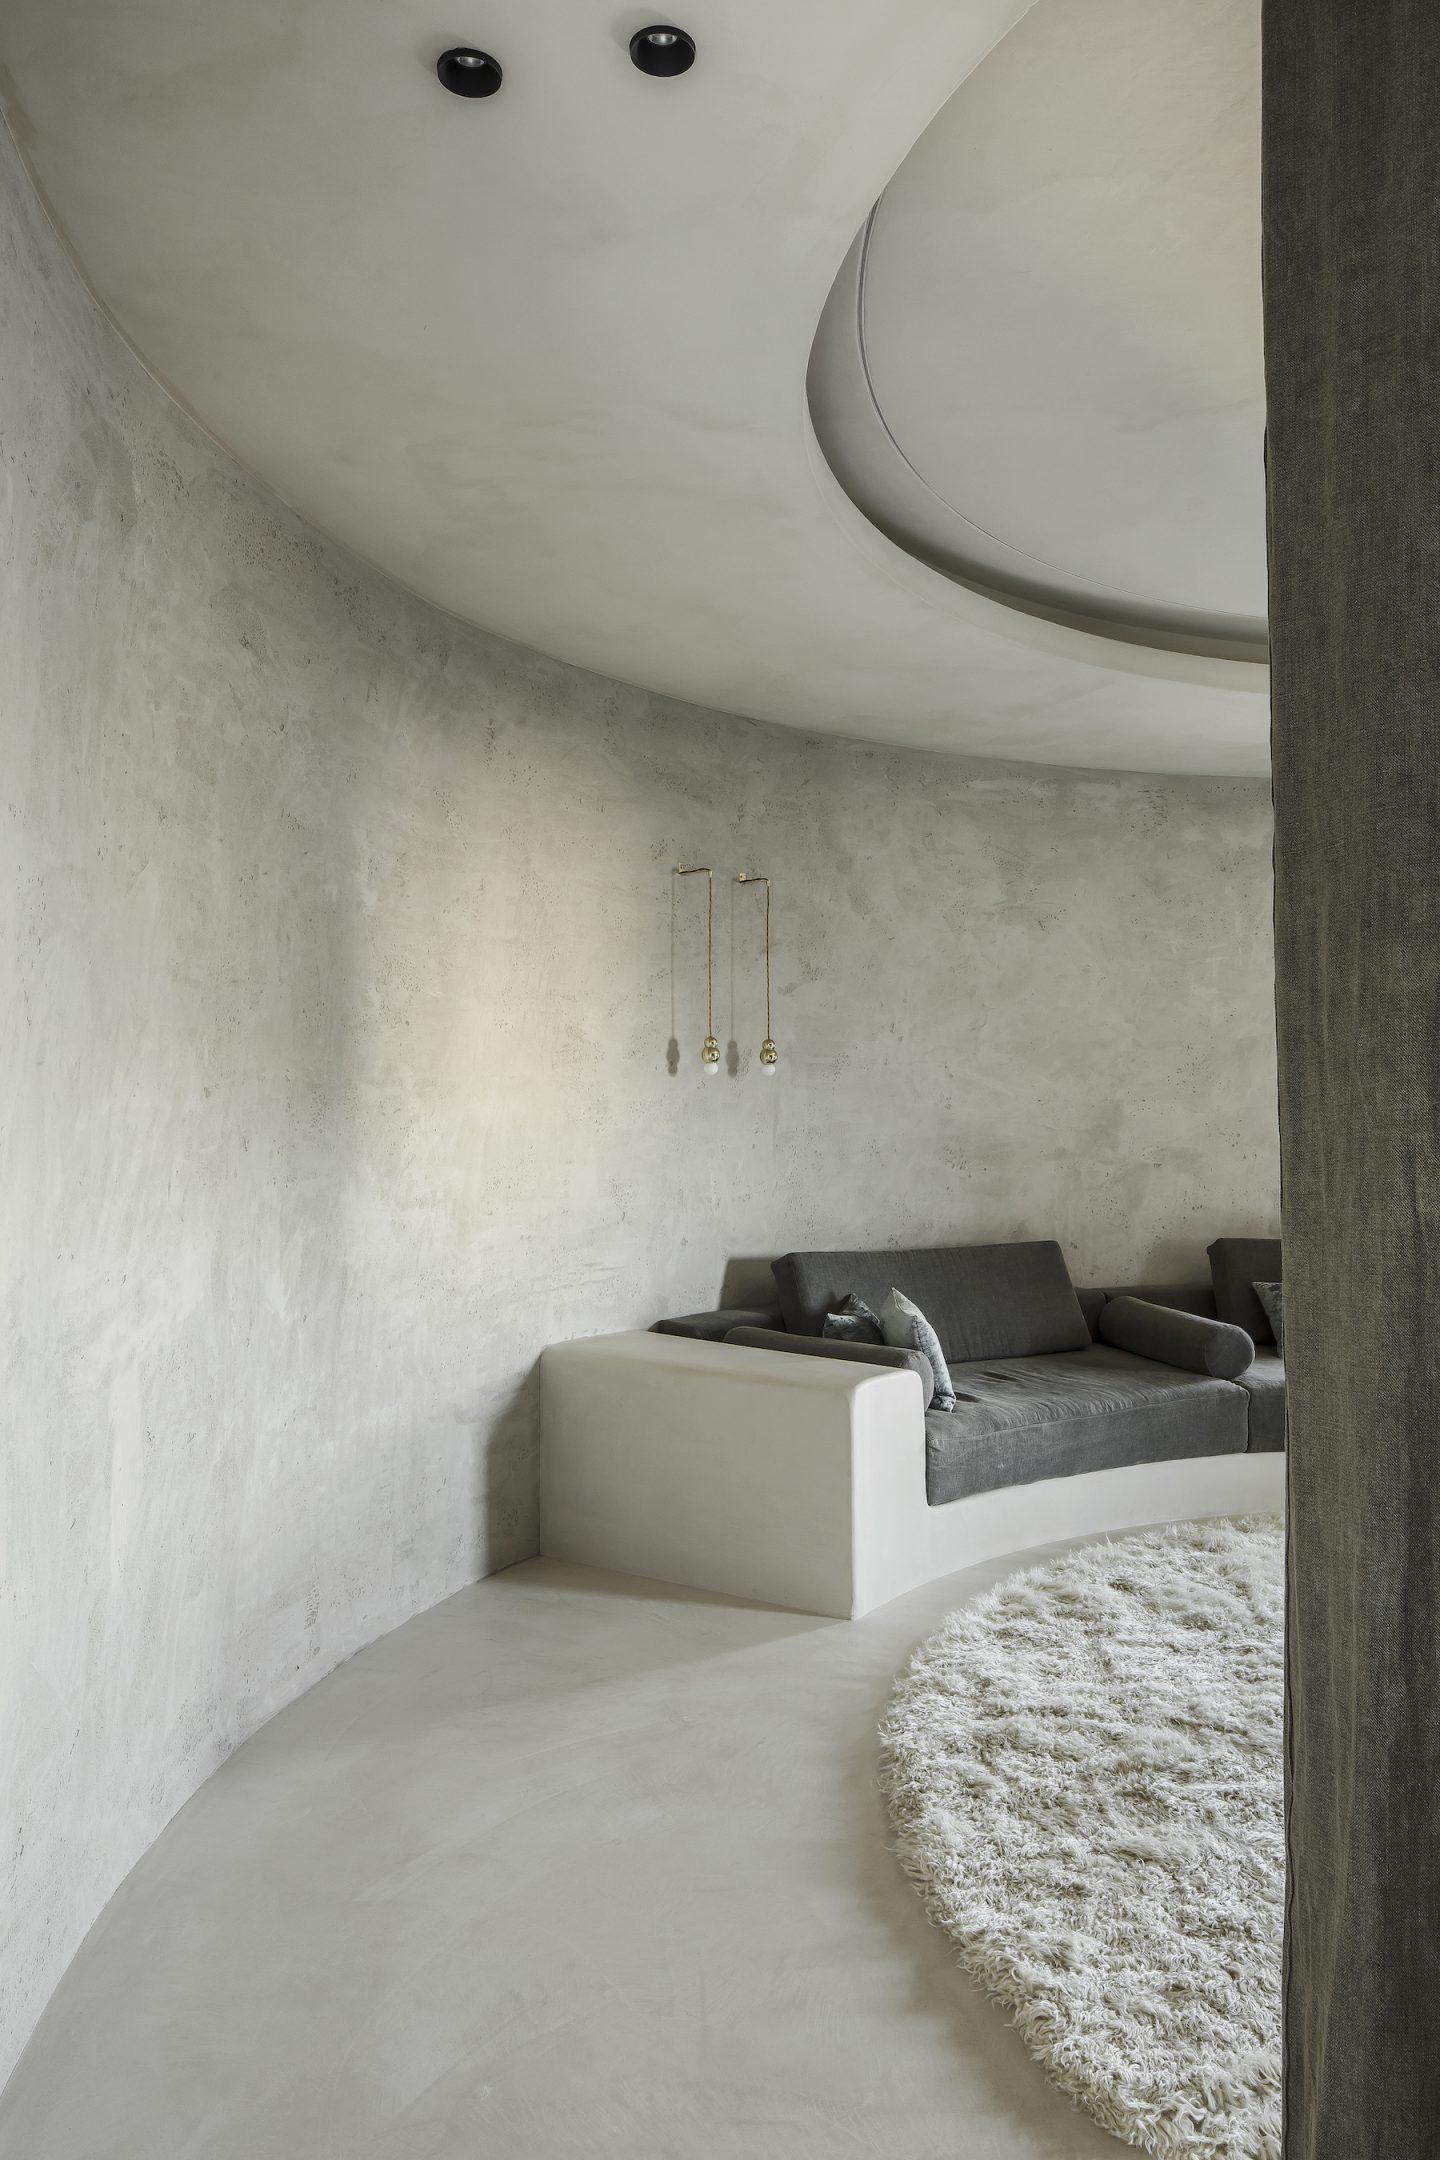 IGNANT-Architecture-Arjaan-De-Feyter-Silo-Apartment-12